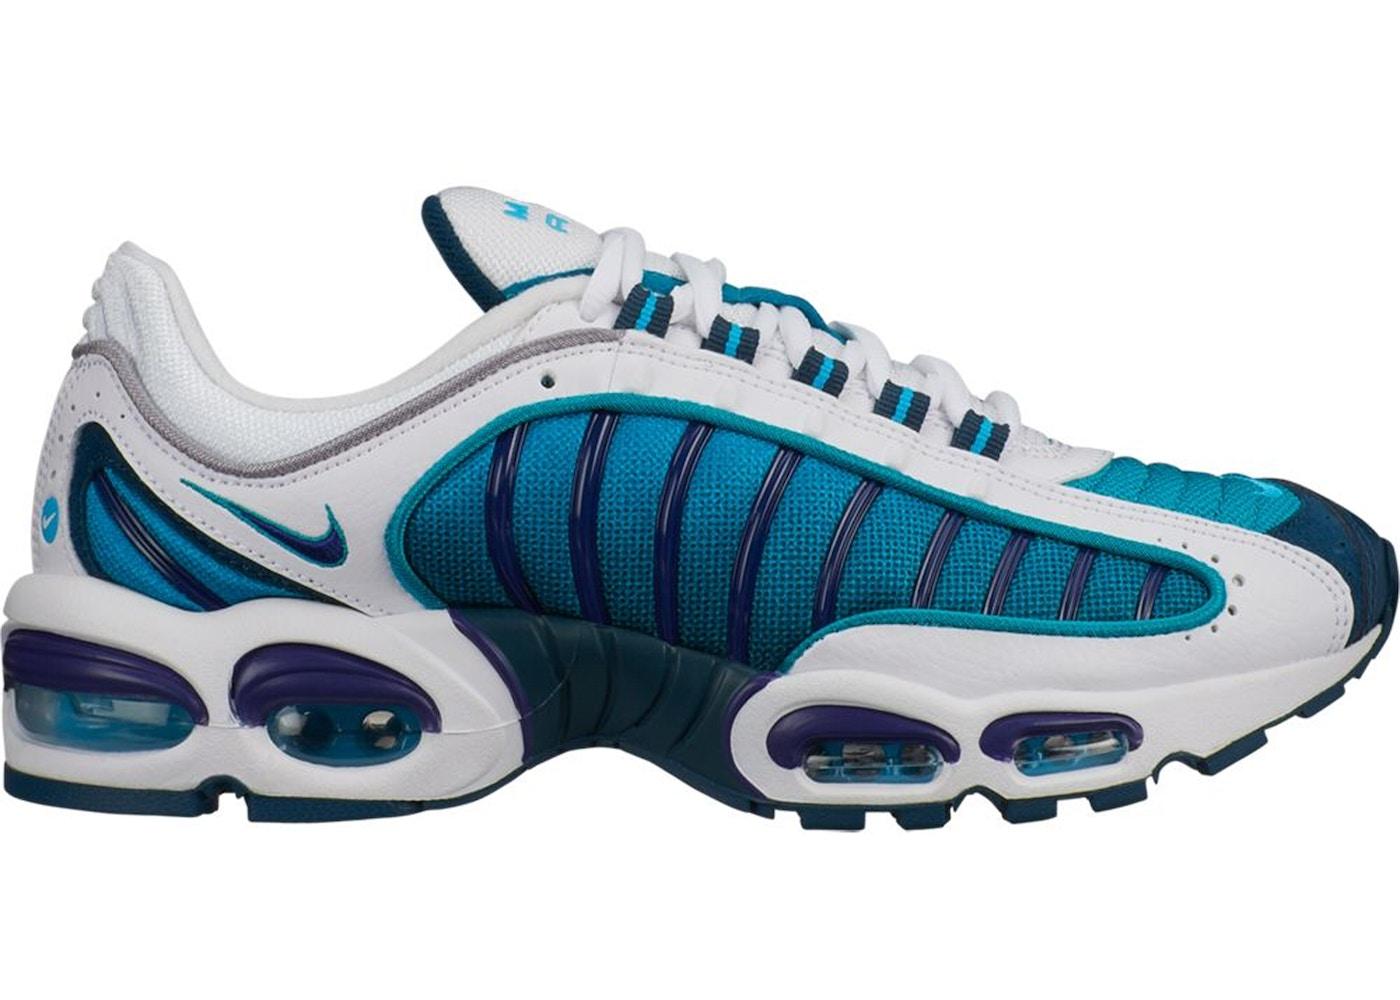 release date 5e2d4 69da1 Nike Air Max Other Shoes - New Highest Bids